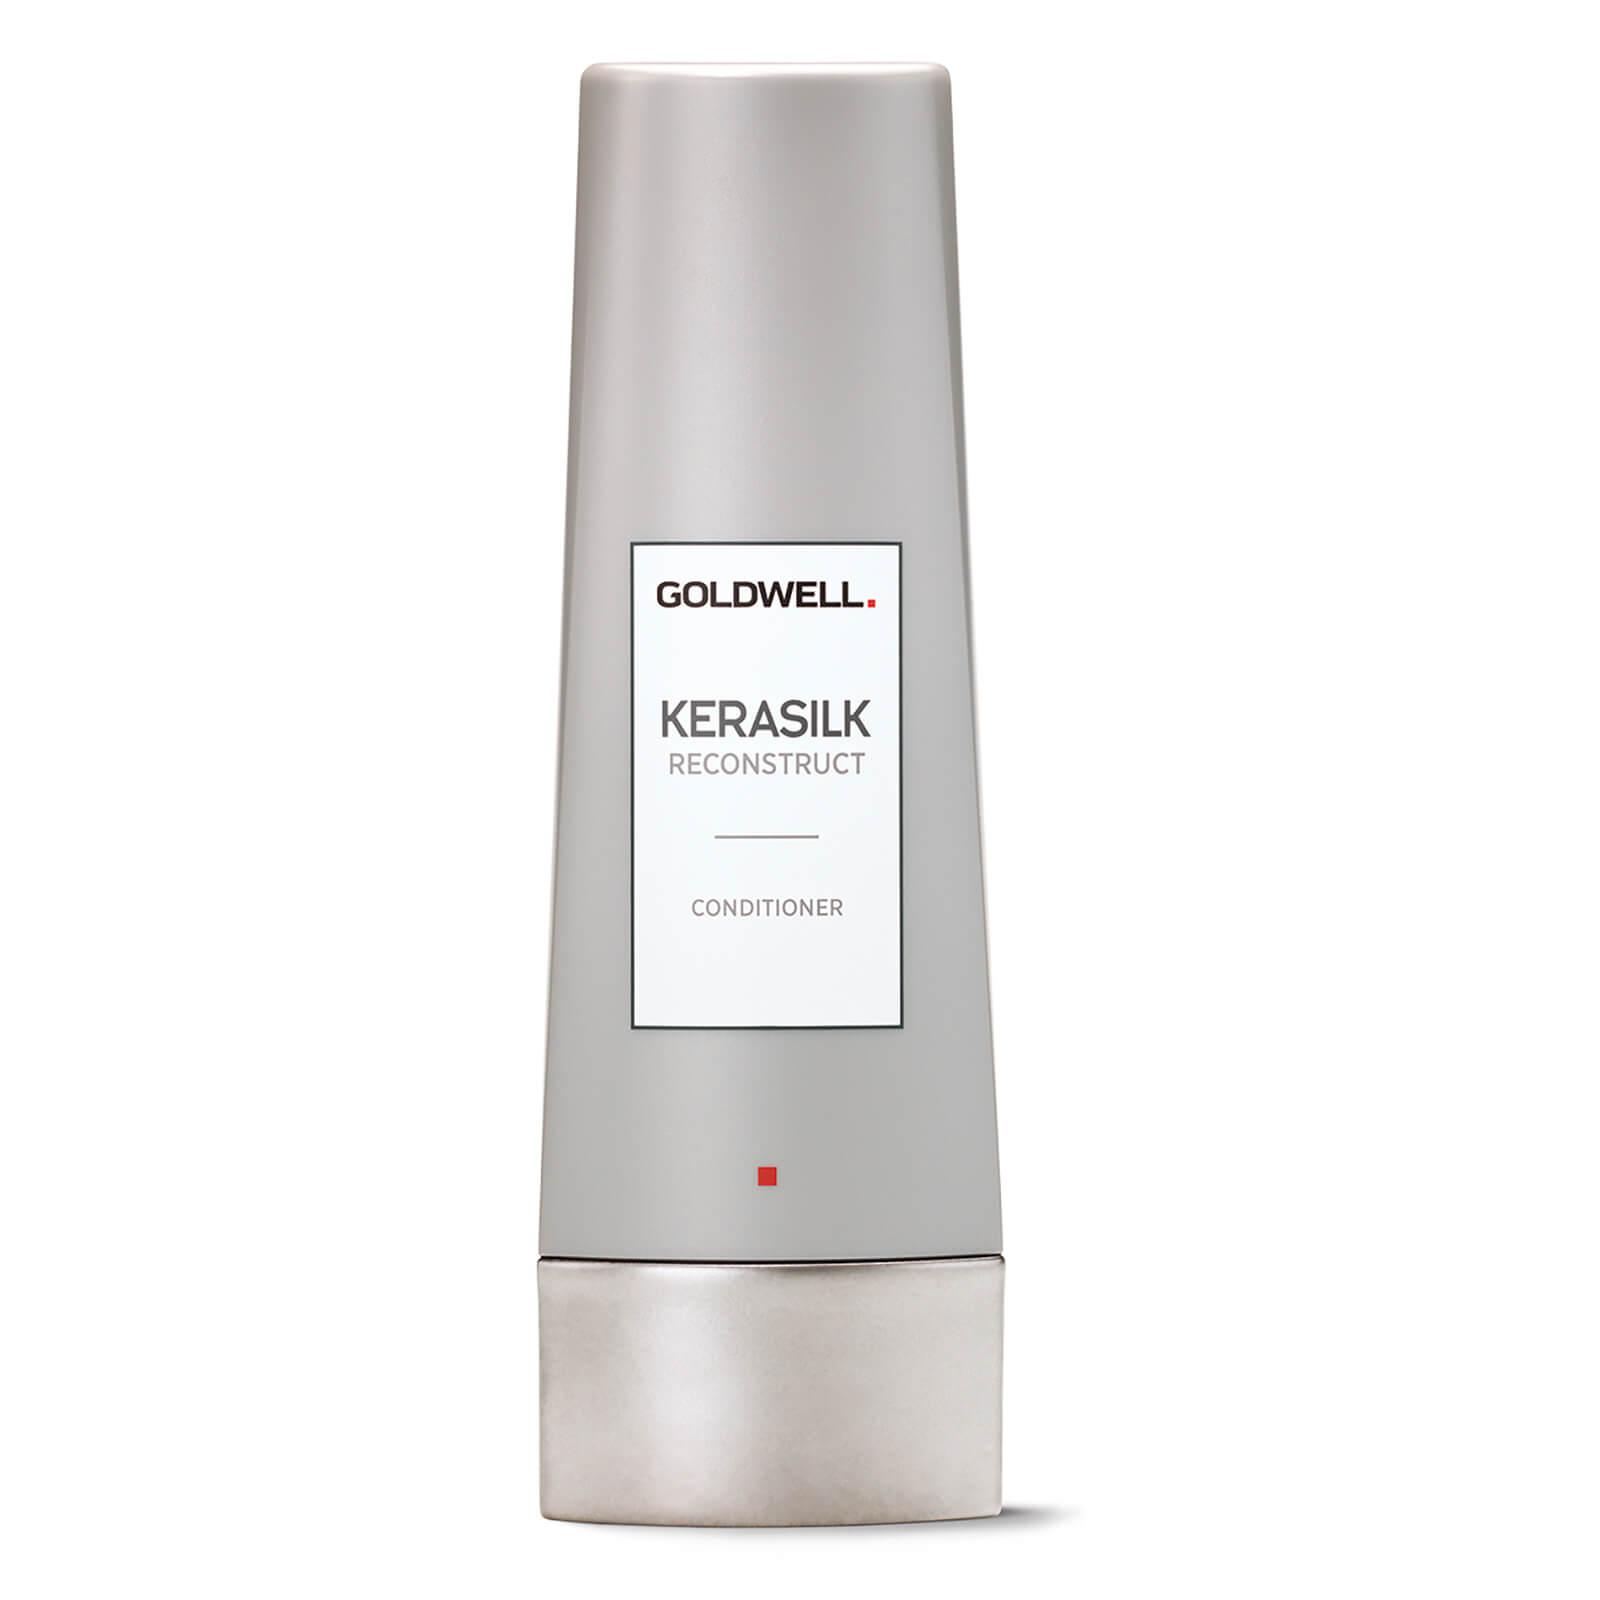 Купить Goldwell Kerasilk Re-construct Conditioner 200ml